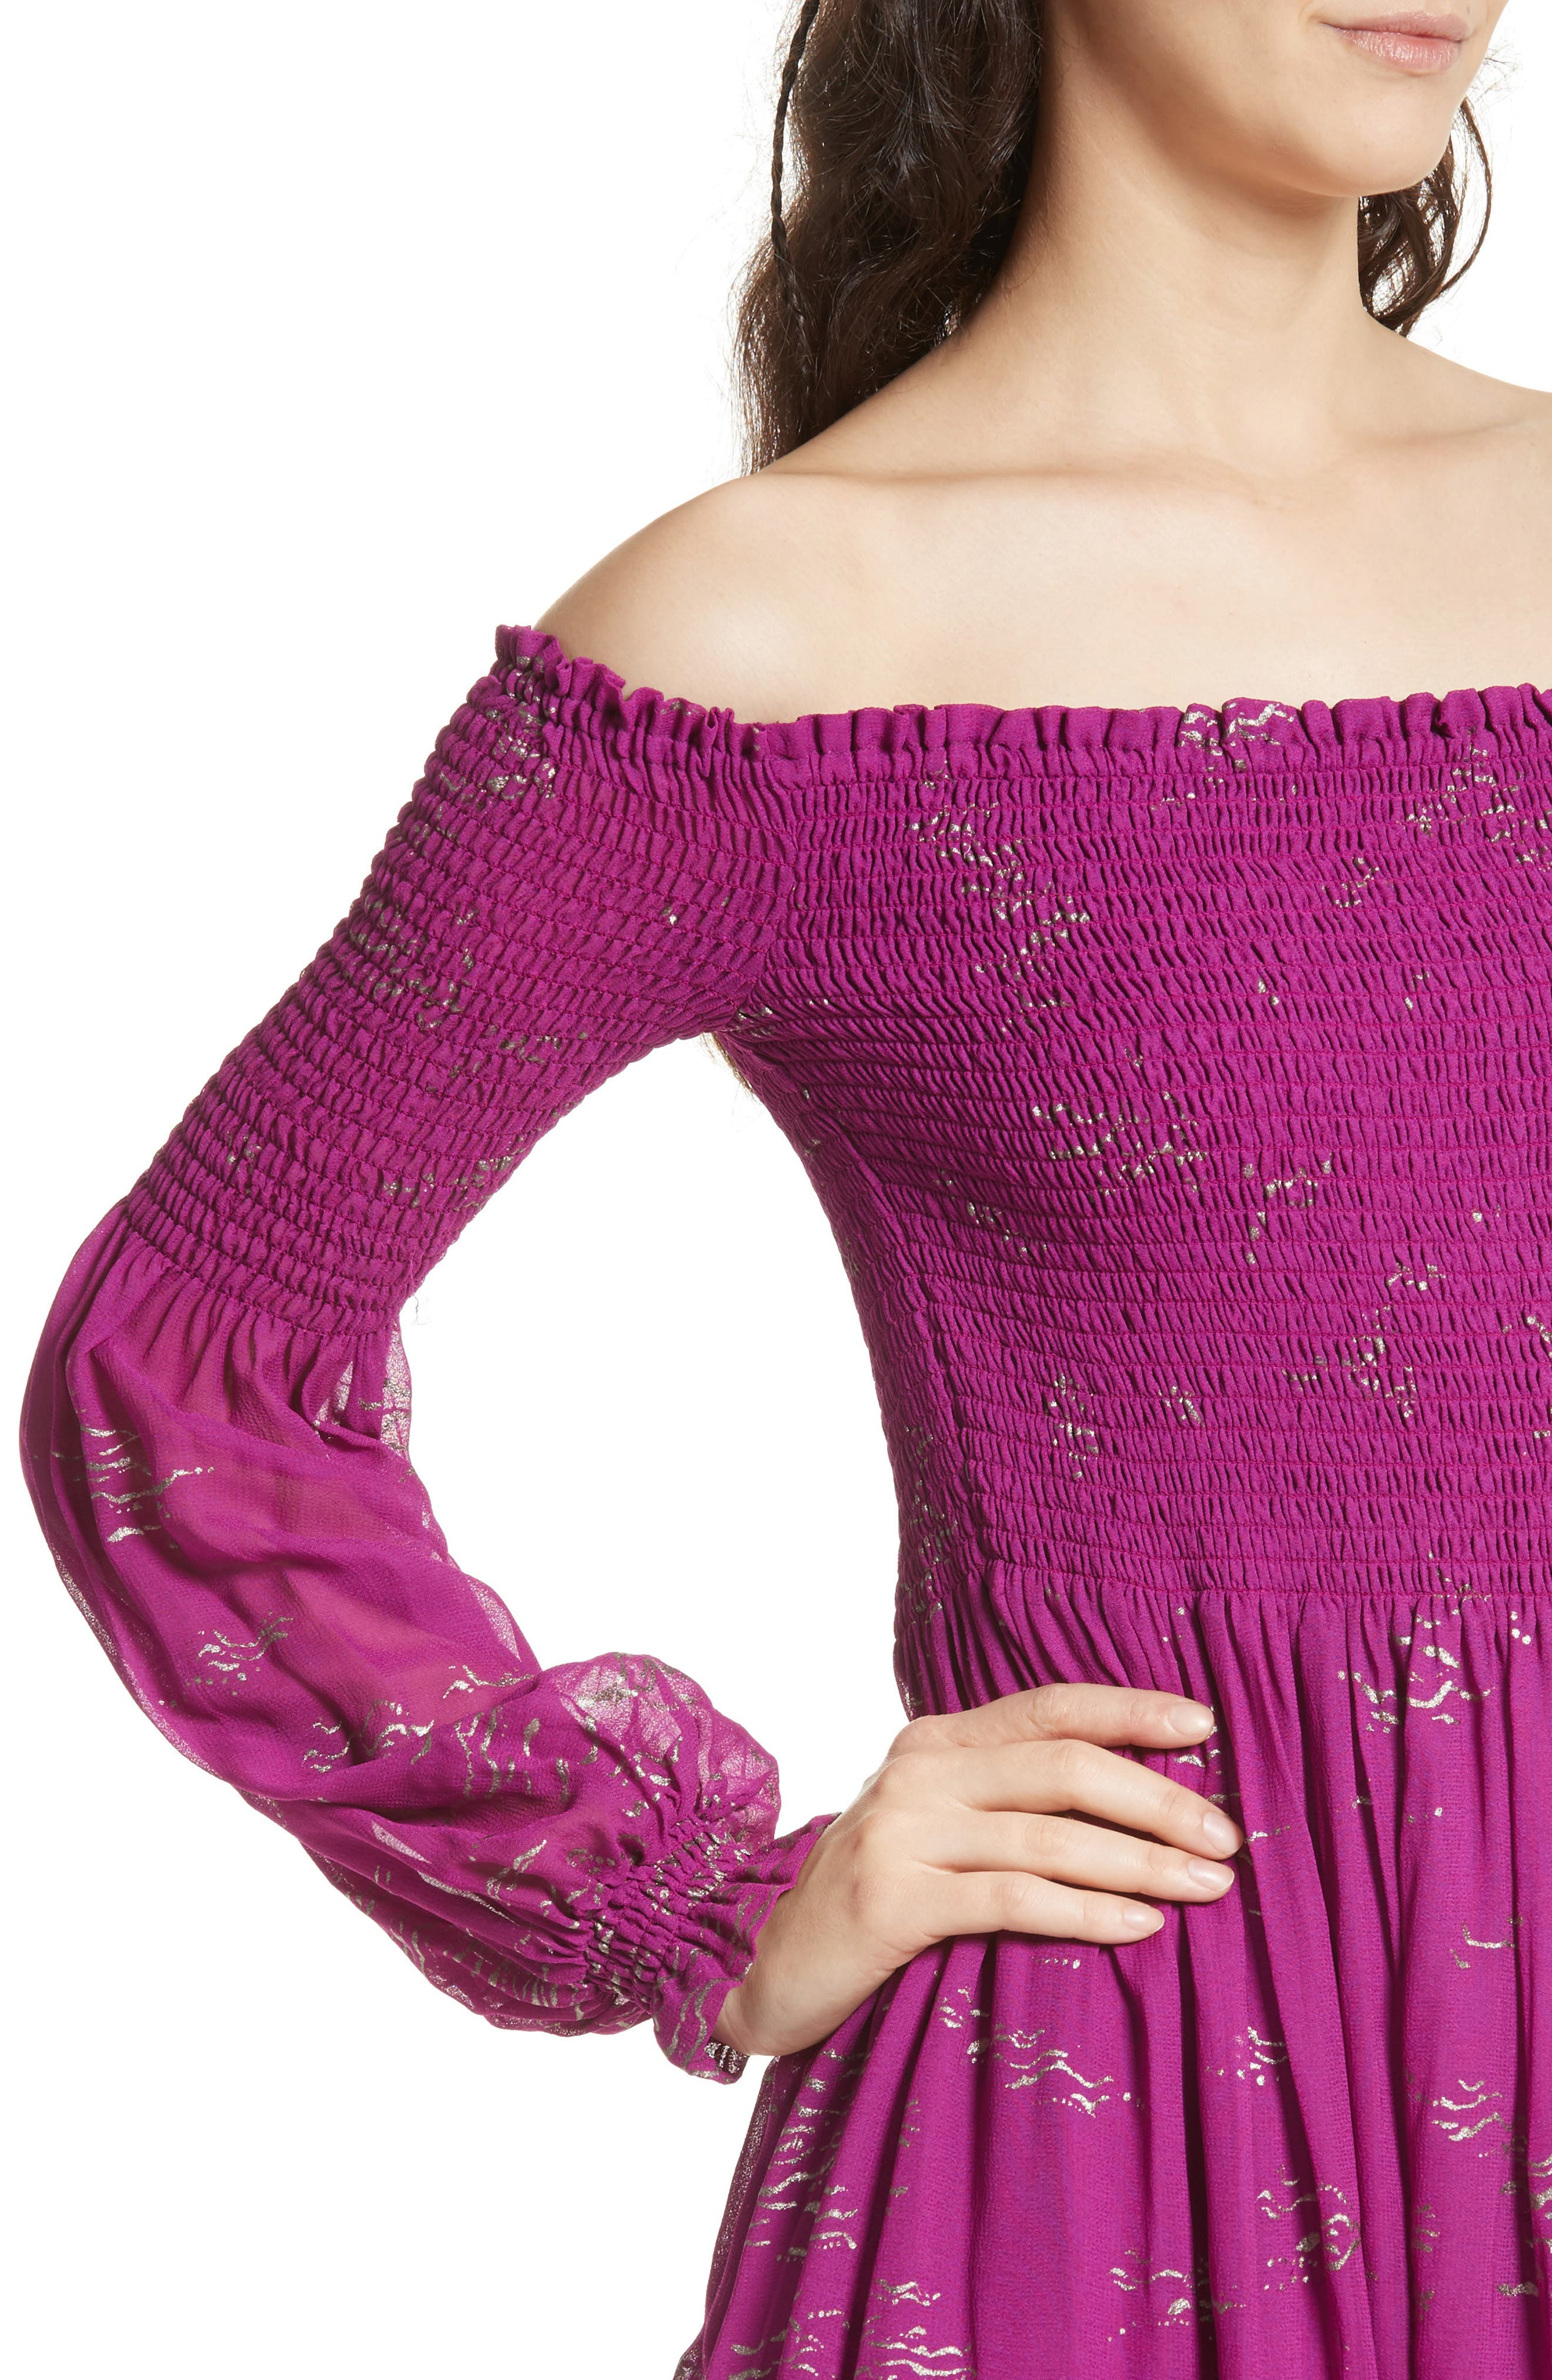 Foiled Smocked Midi Dress,                             Alternate thumbnail 8, color,